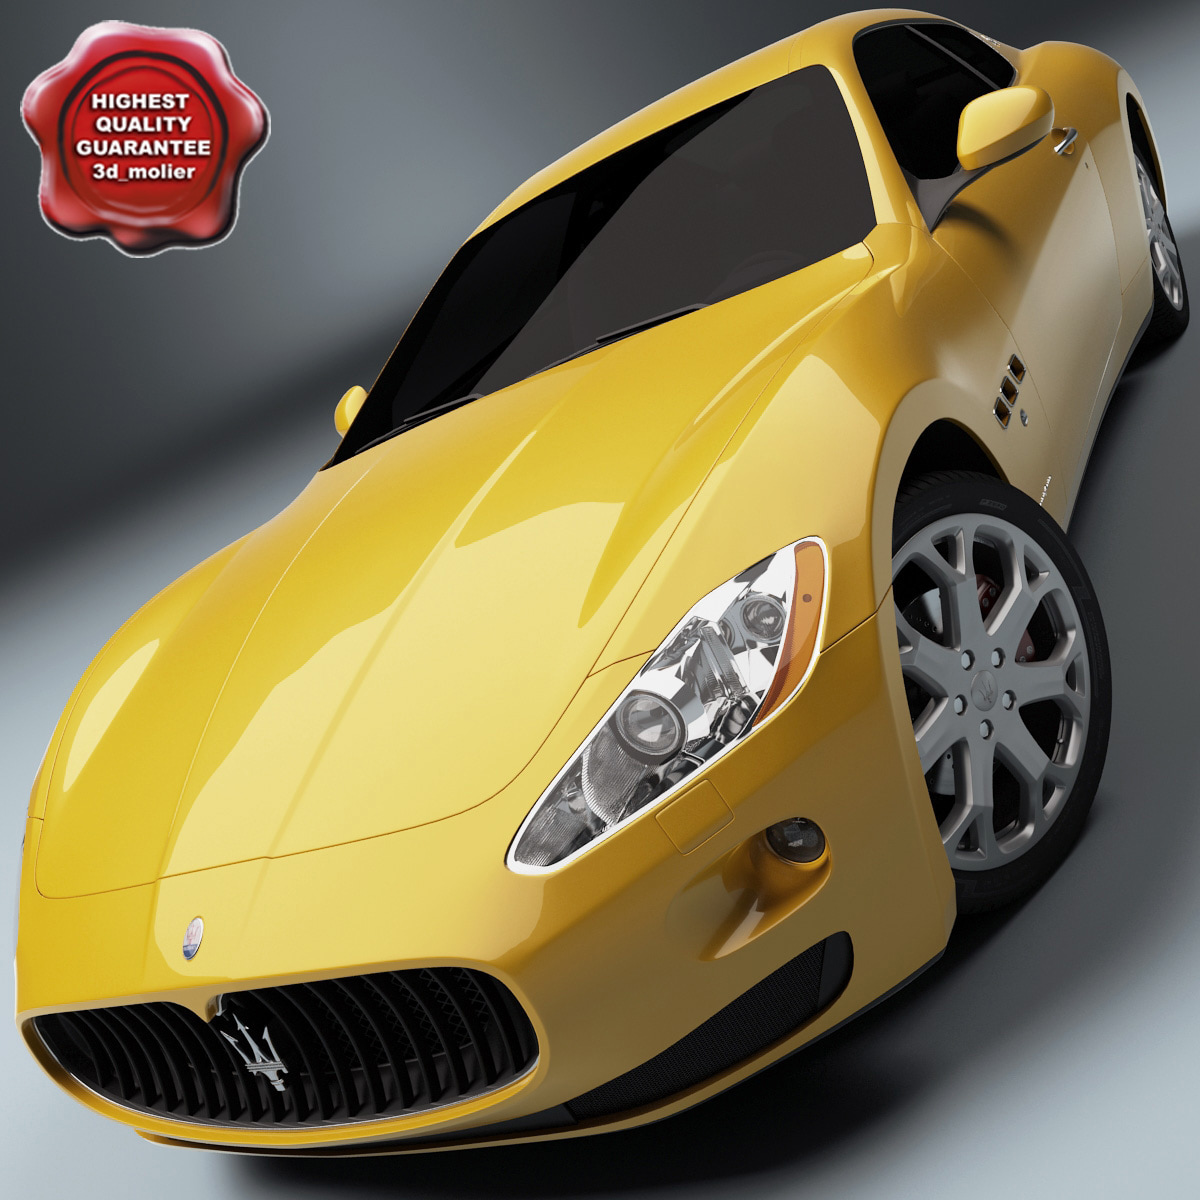 Maserati_GranTurismo_00.jpg